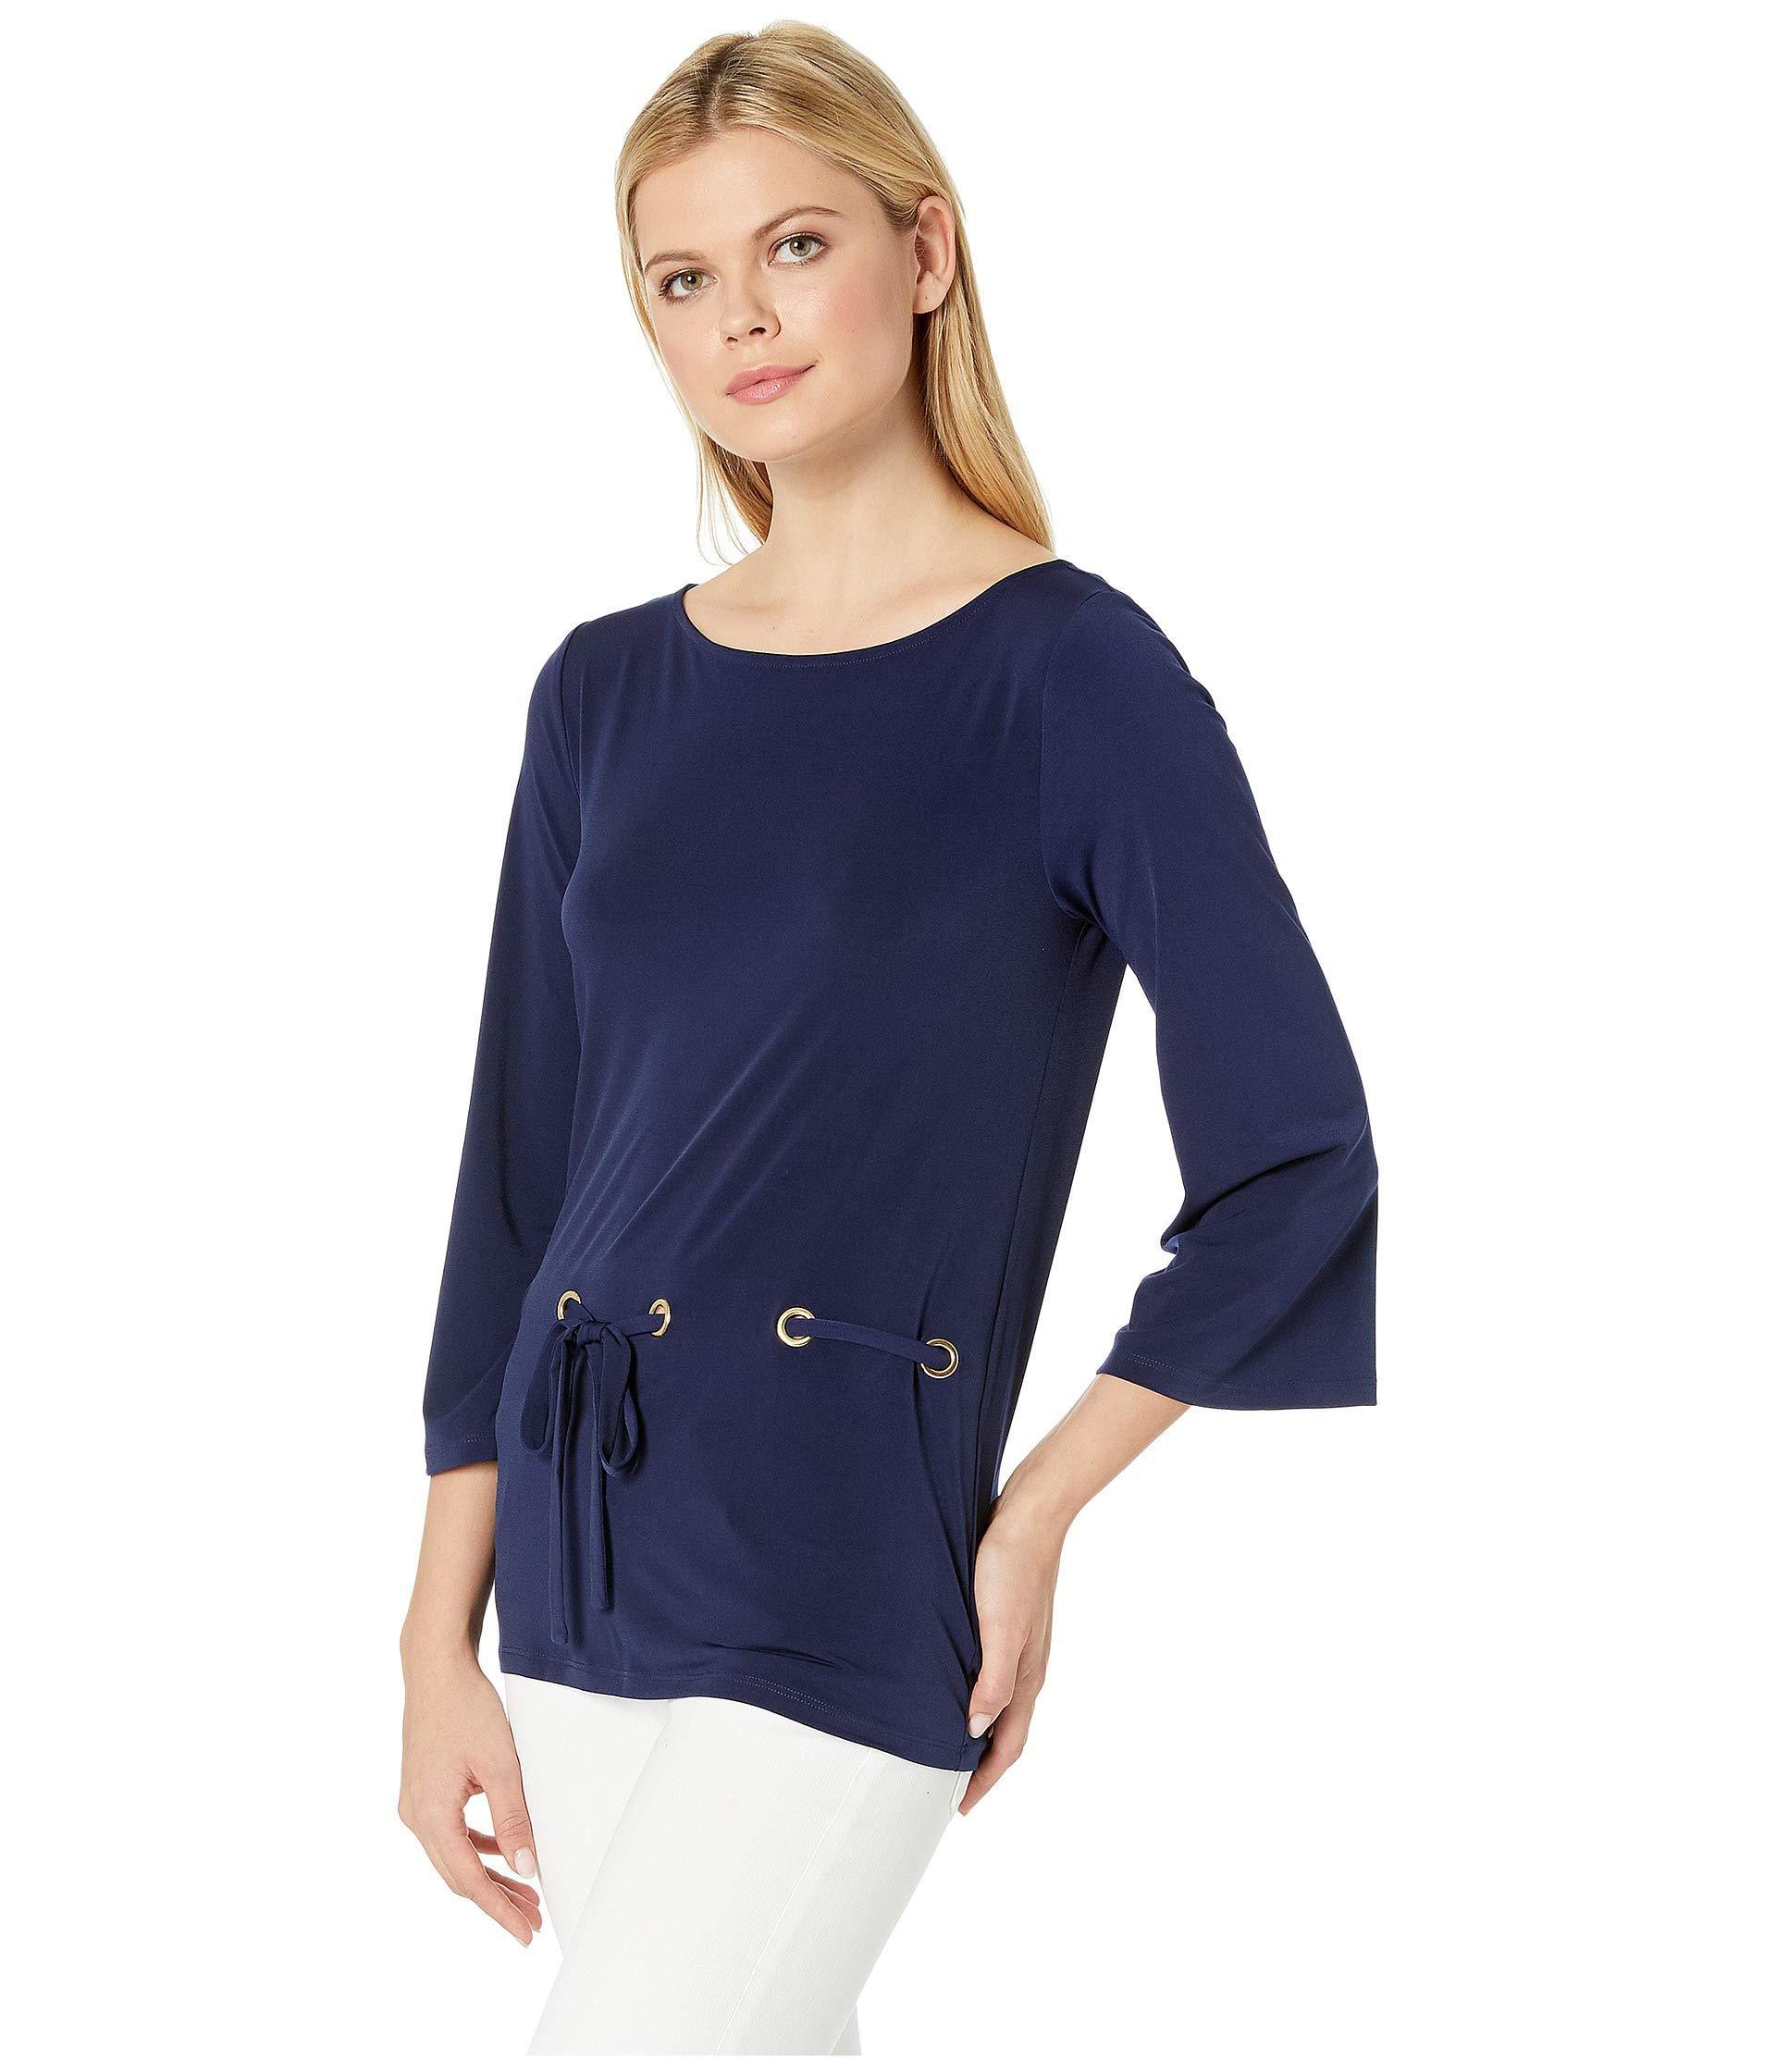 d76eea5500846 Lyst - MICHAEL Michael Kors Grommet Tie Thru Top (black) Women s Clothing  in Blue